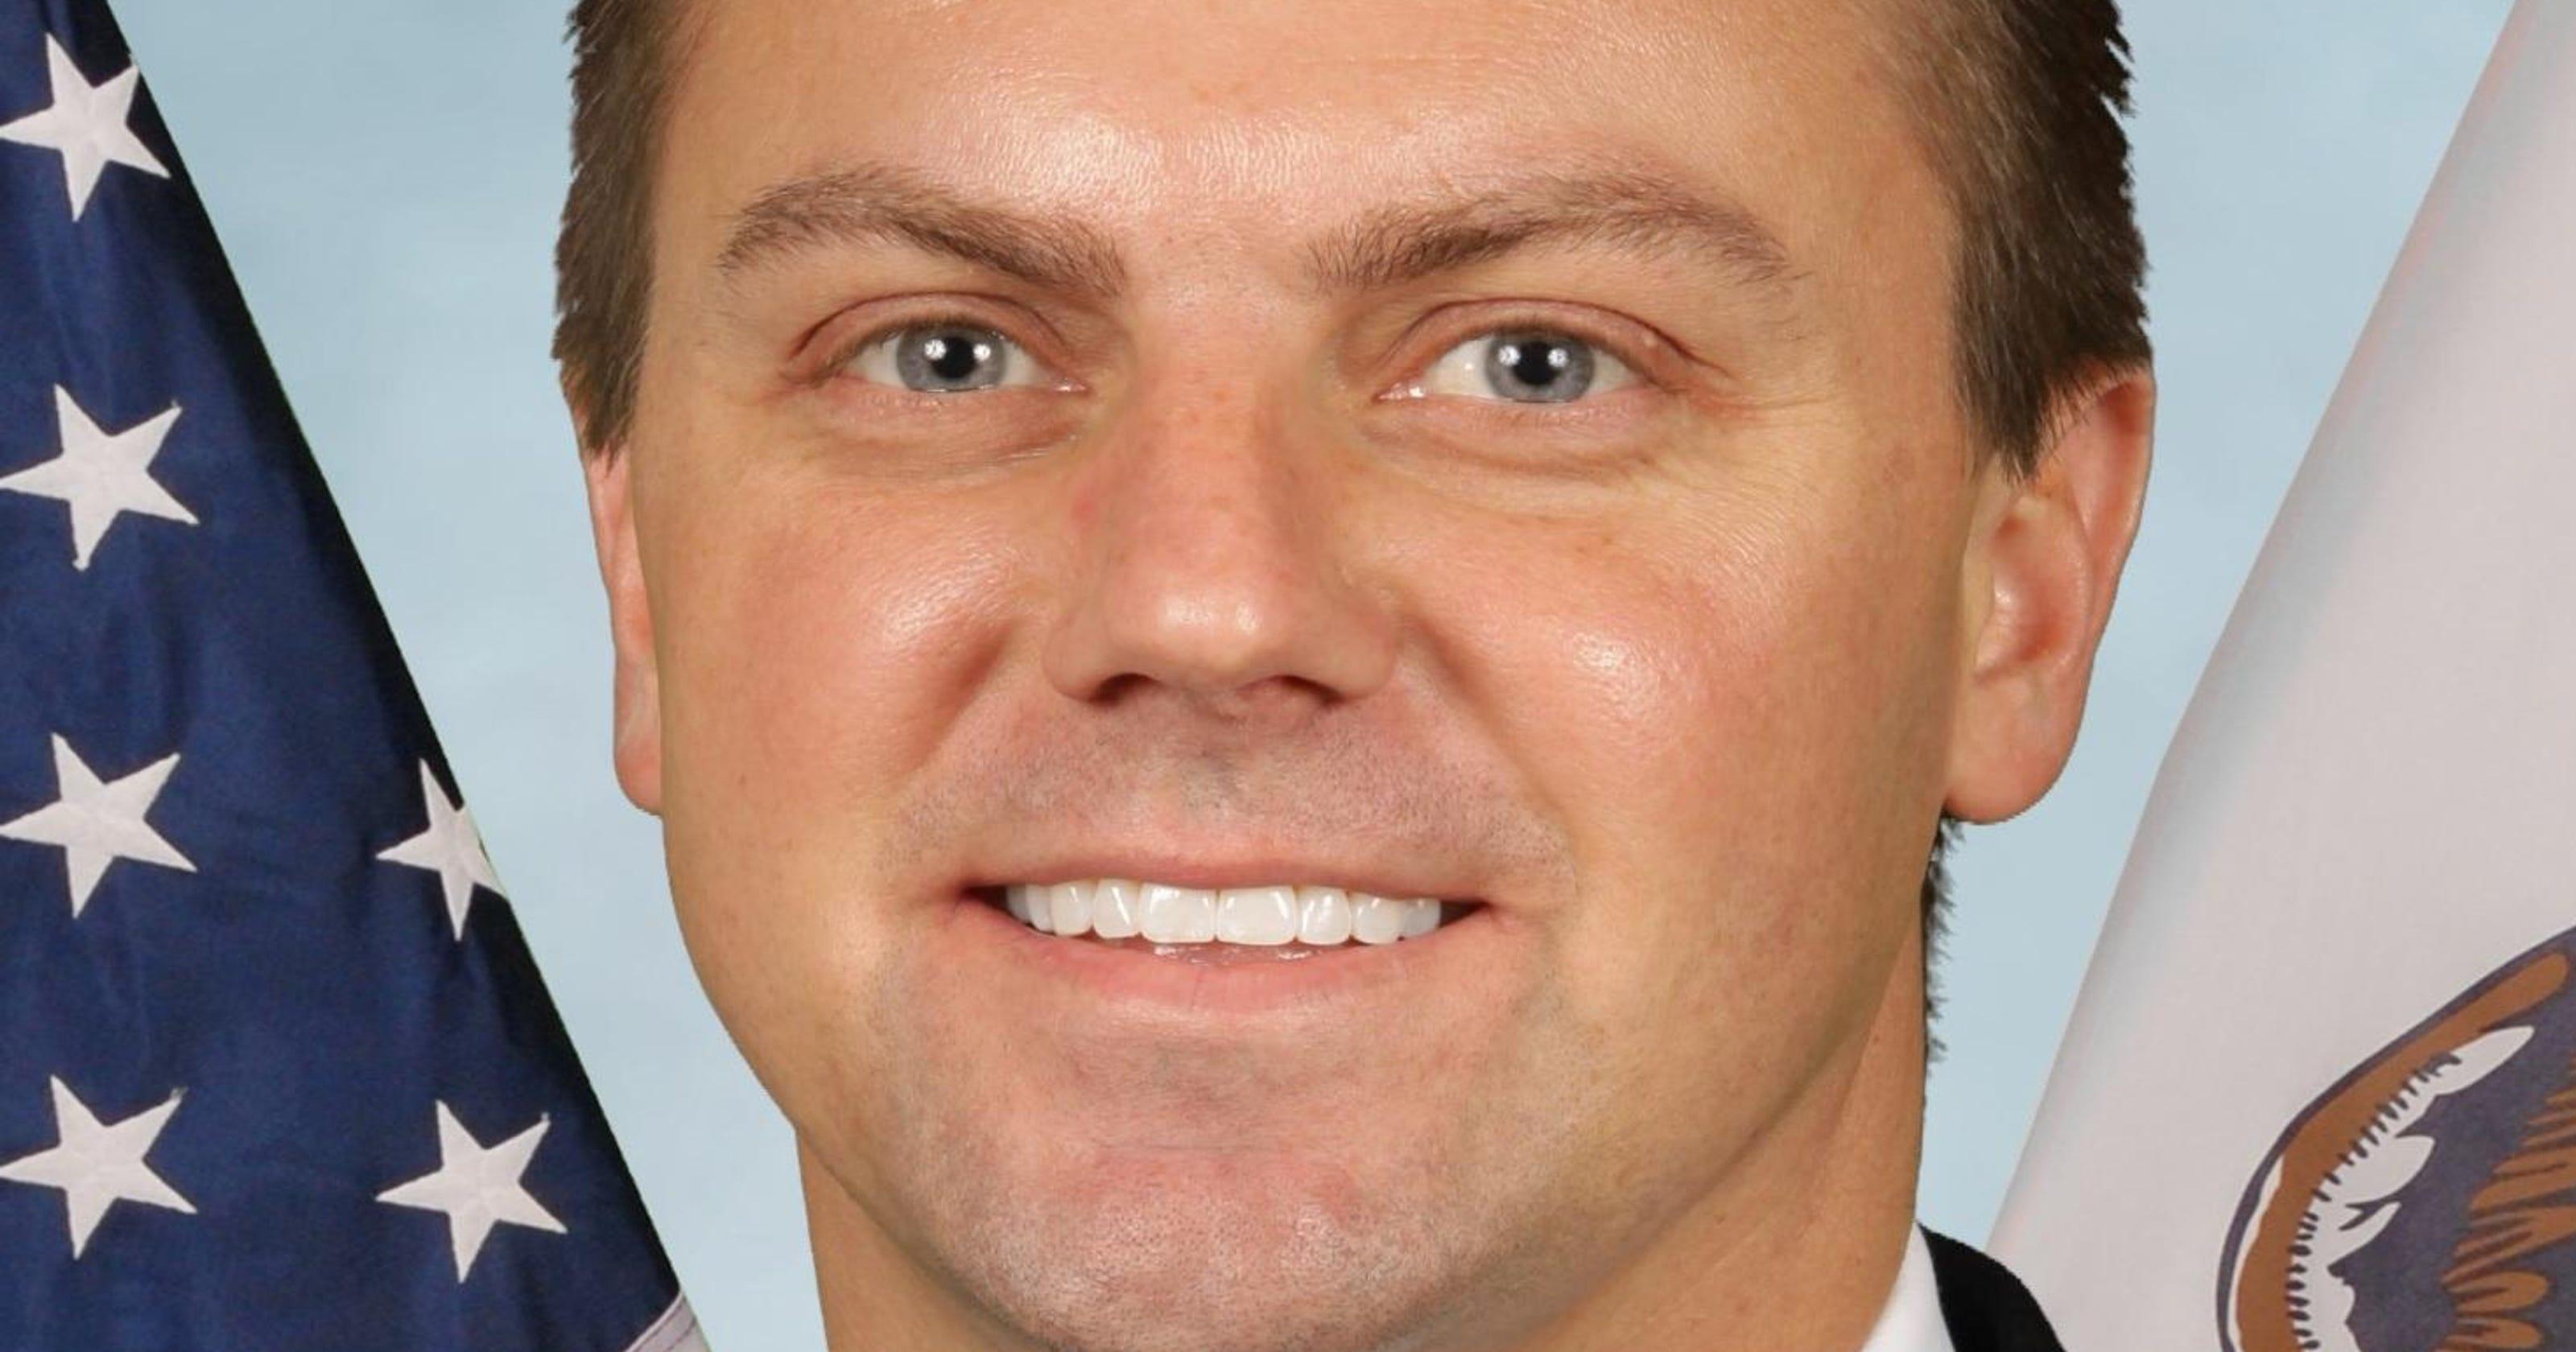 Senator Looks To Ease Burden For >> Whitver Iowa Senate Bills Ease Burden Of Aca Collapse